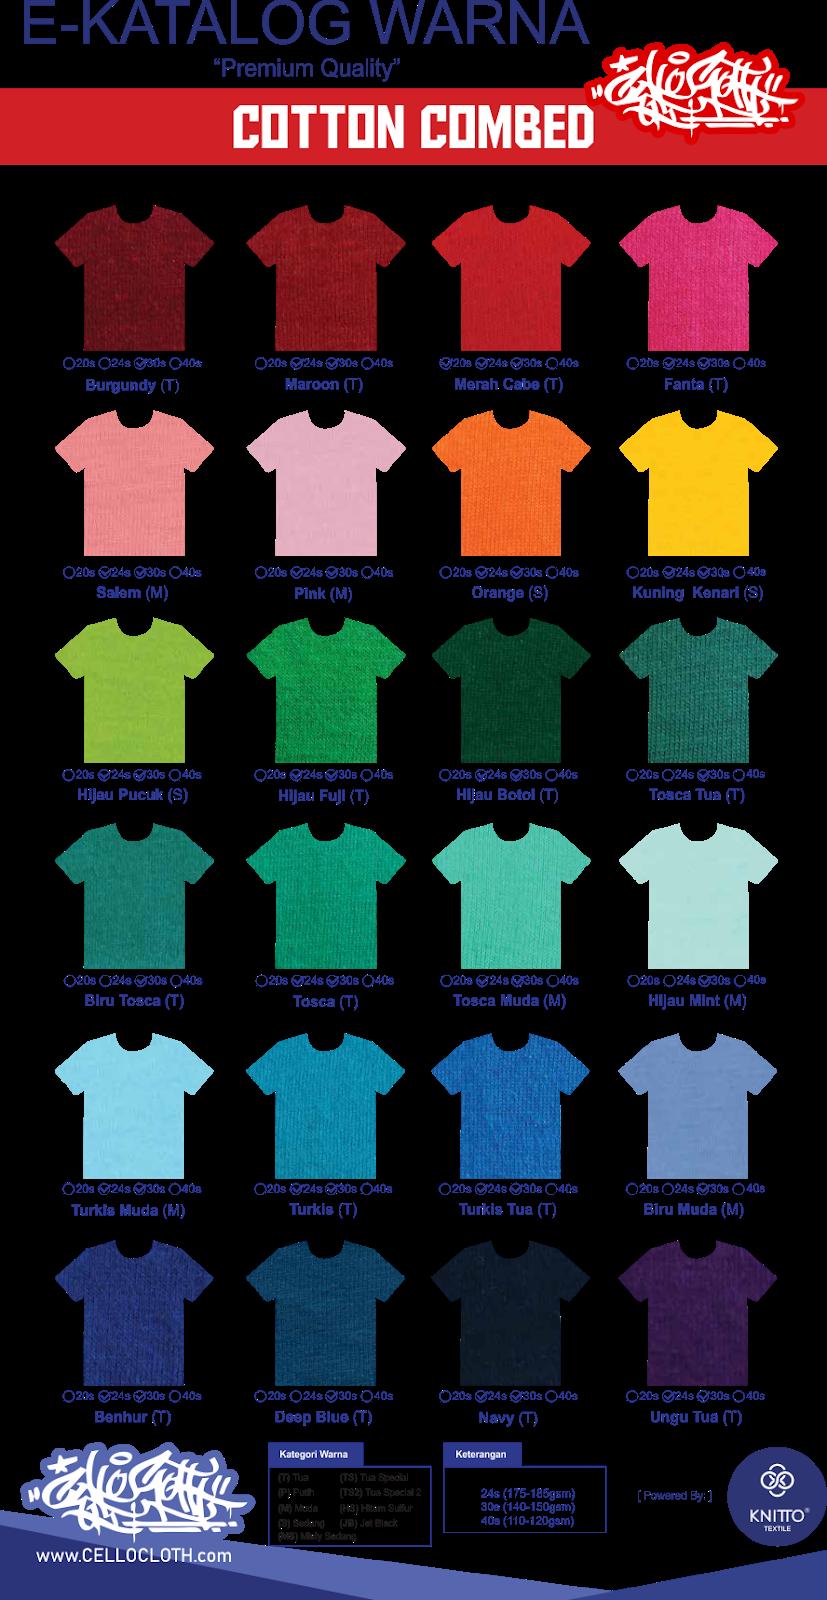 bahan kain, bahan kaos, warna bahan kaosm warna kaos, warna polo, warna kemeja lapangan, warna bahan cardet, warna kain kaos polos, warna kaos sablon, kaos raglan, kaos raglan 3/4, kaos raglan combed, kaos raglan lengan panjang, custom kaos raglan jogja, kaos raglan depan belakang, kaos raglan 2 warna, kaos raglan 3warna, kaos raglan desain sendiri, kaos raglan pola 3 warna, katalog kain, katalog bahan kain, katalog kain combed